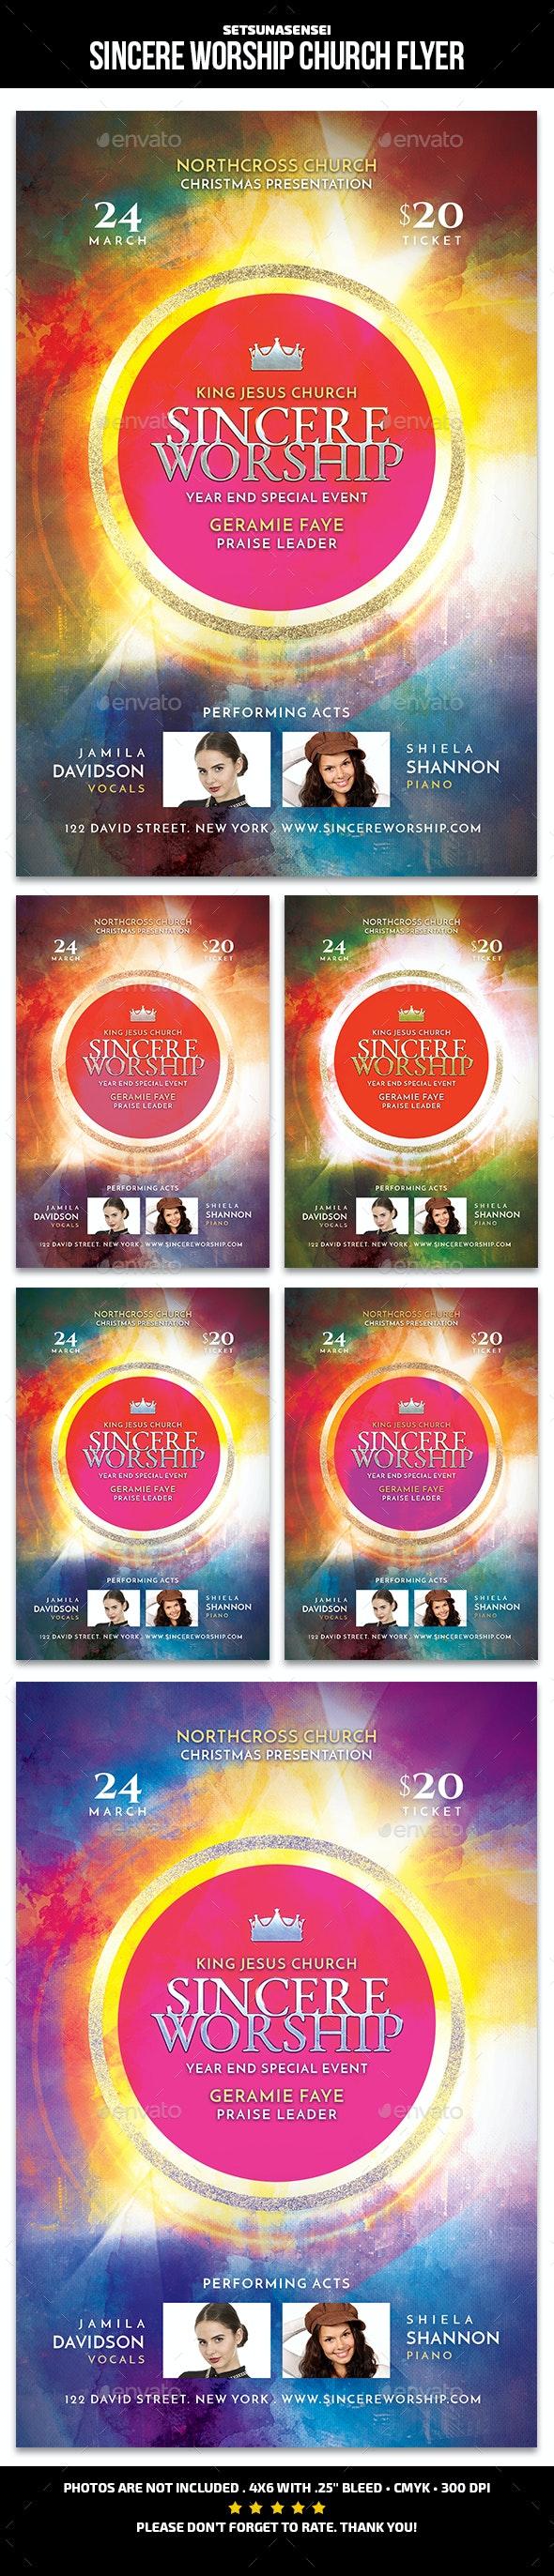 Sincere Worship Church Flyer - Church Flyers